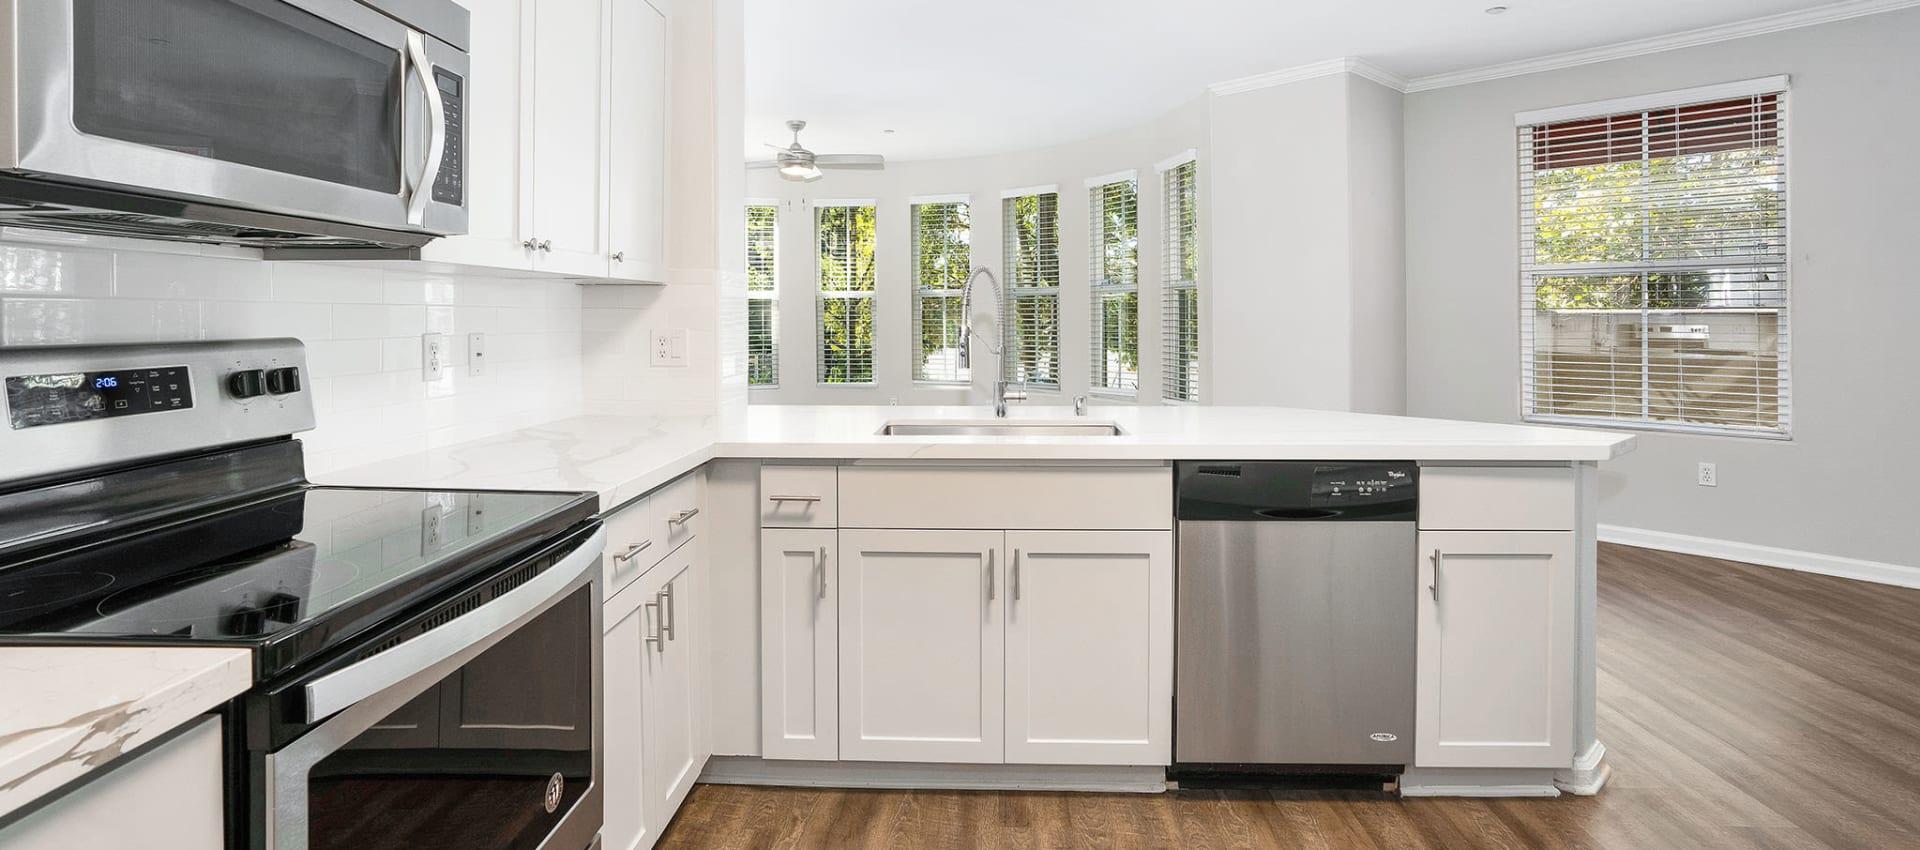 Kitchen at Park Central in Concord, California